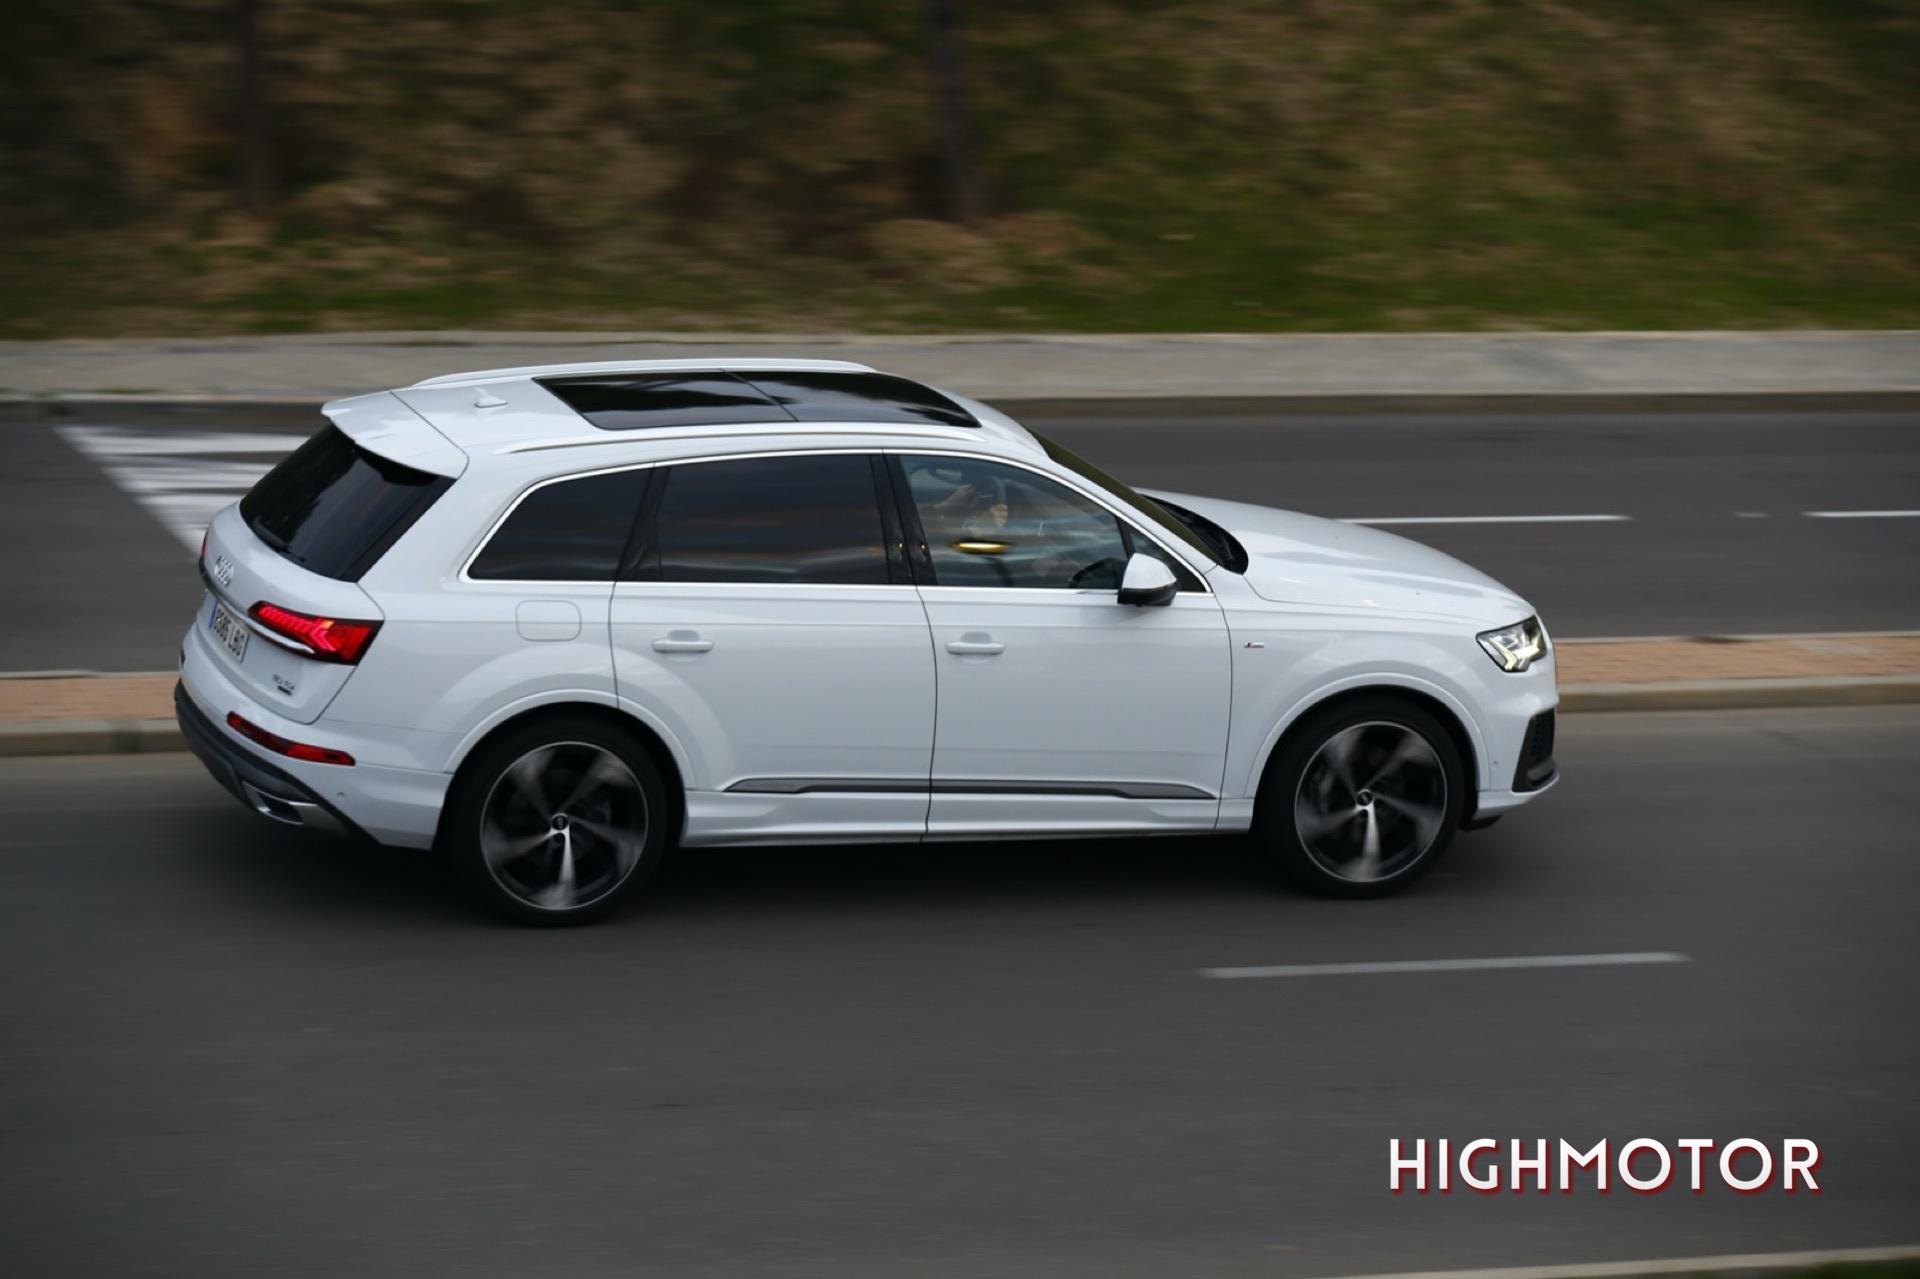 Audi Q7 Tdi 4